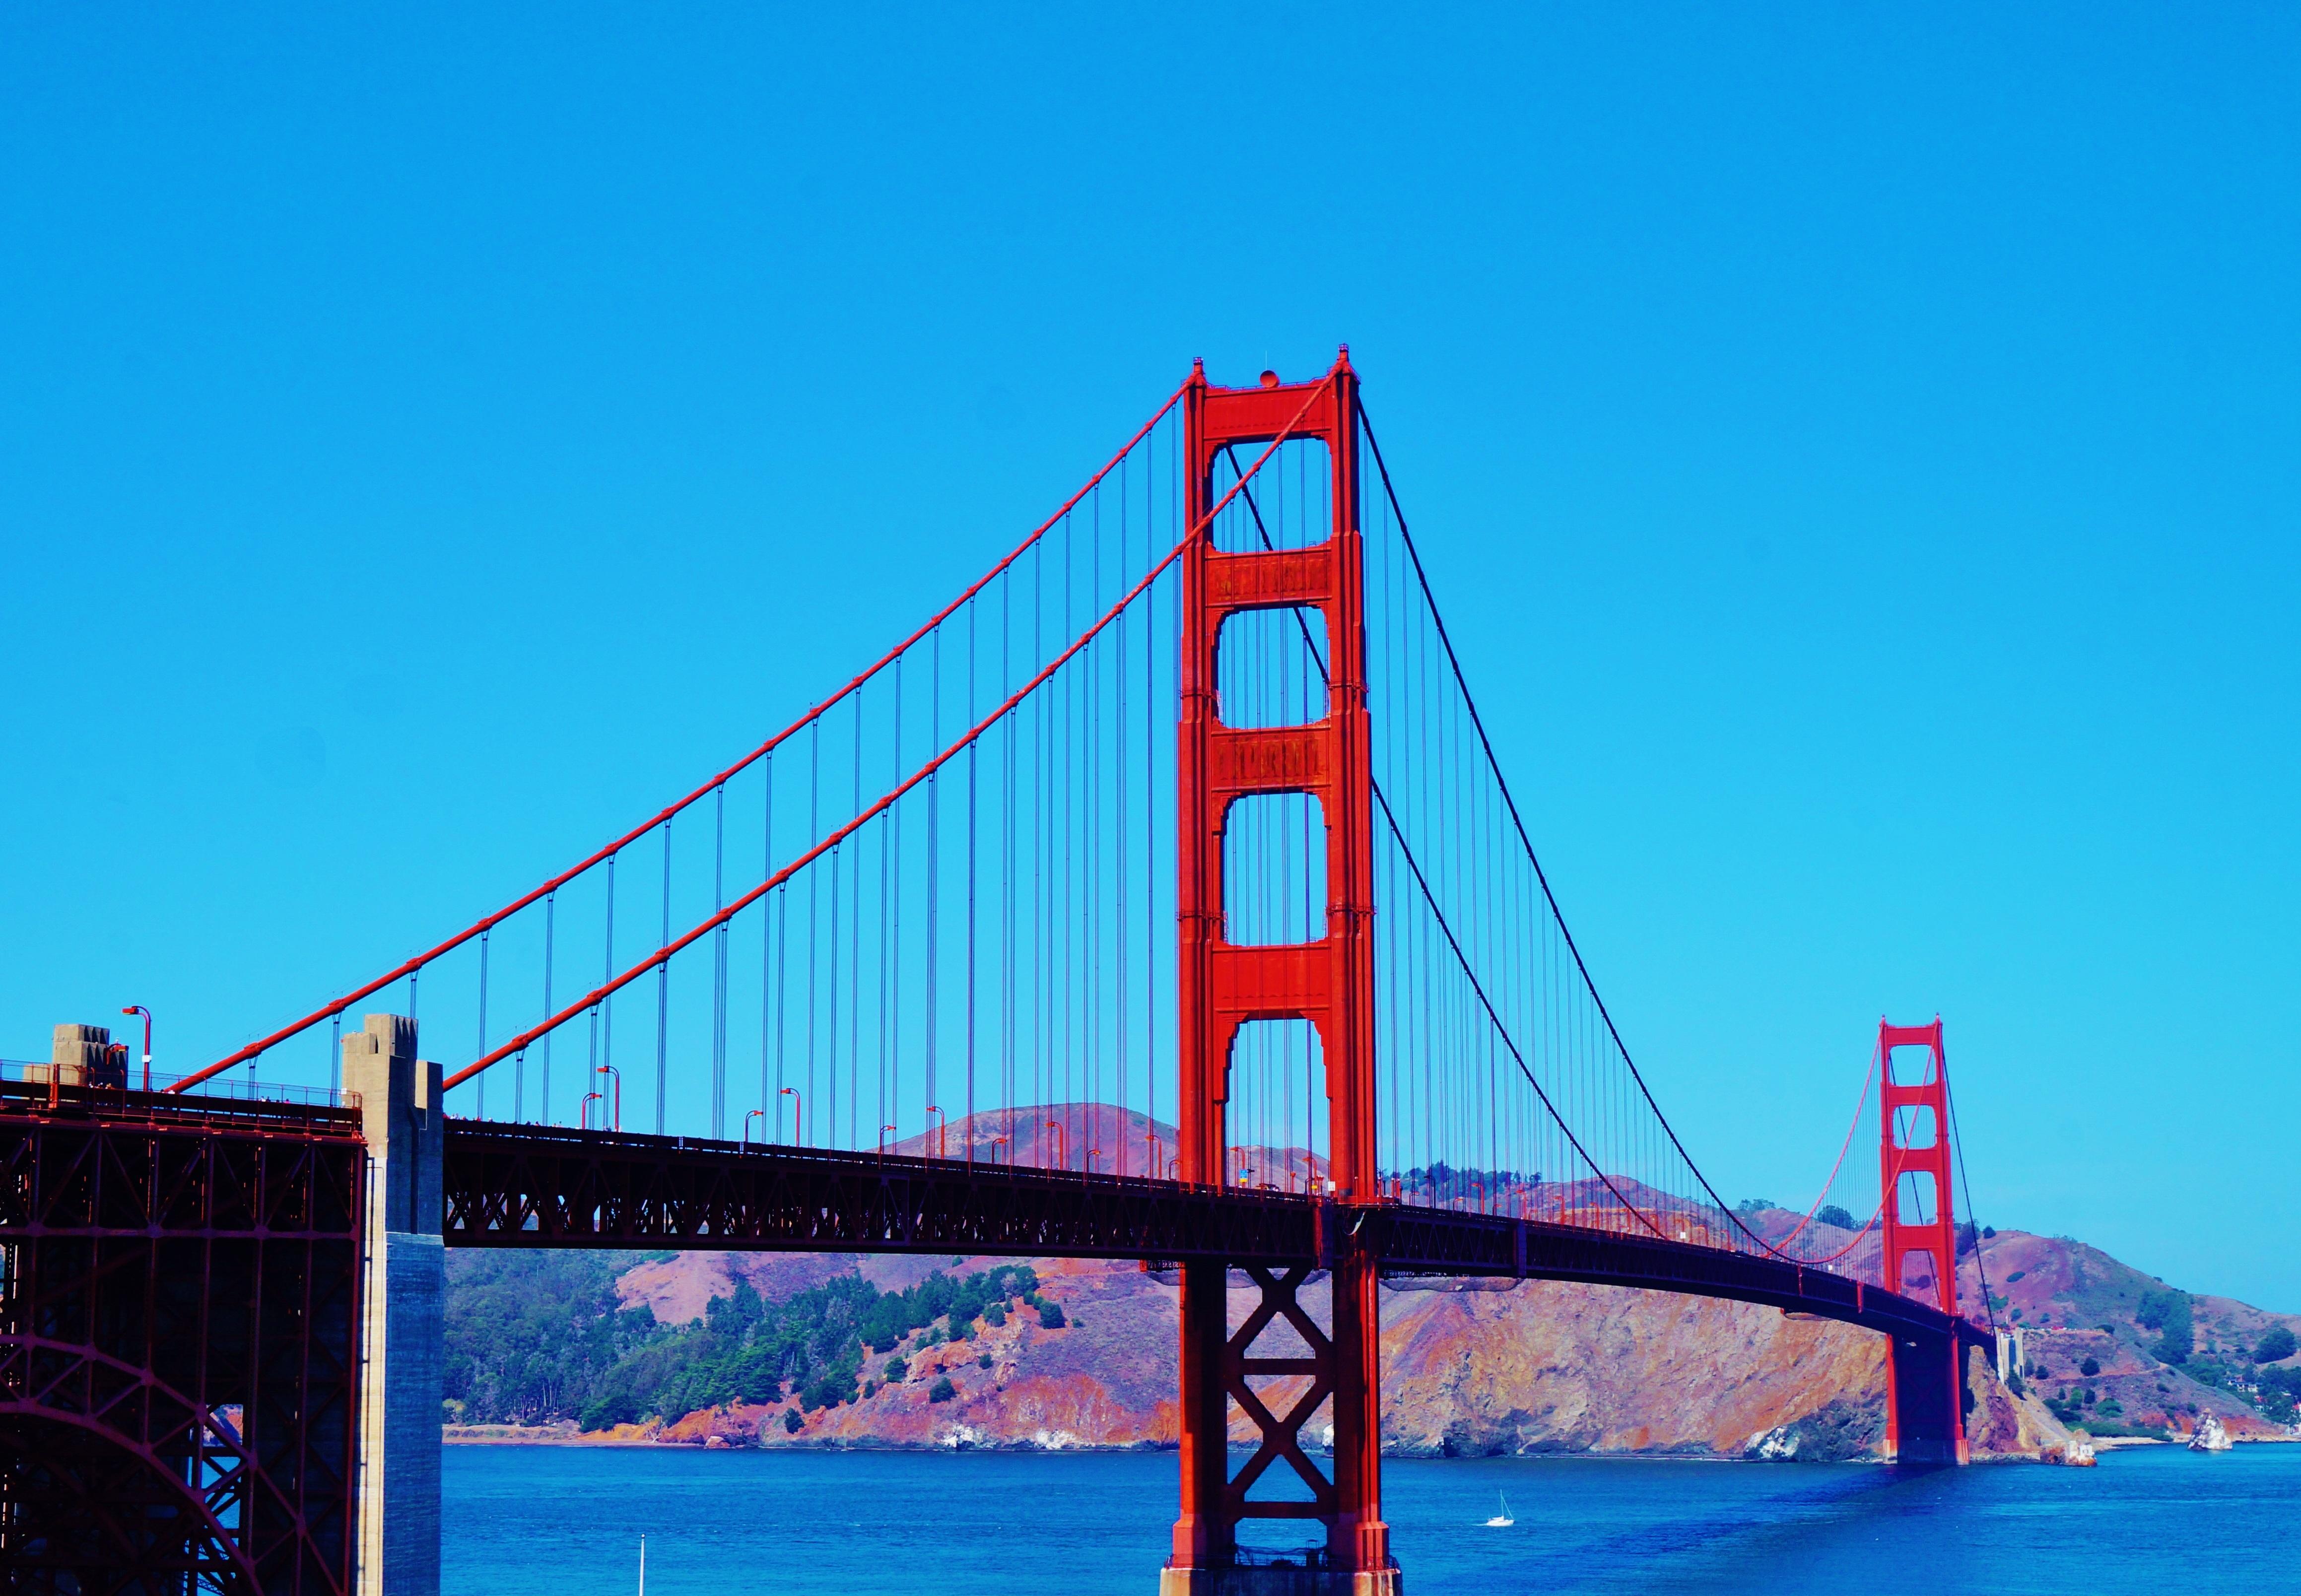 Sea Bridge Suspension Bridge Golden Usa America Landmark Gate California San Ca Francisco Pacific Ocean Cable Stayed Bridge San Francisco Bay Nonbuilding Structure